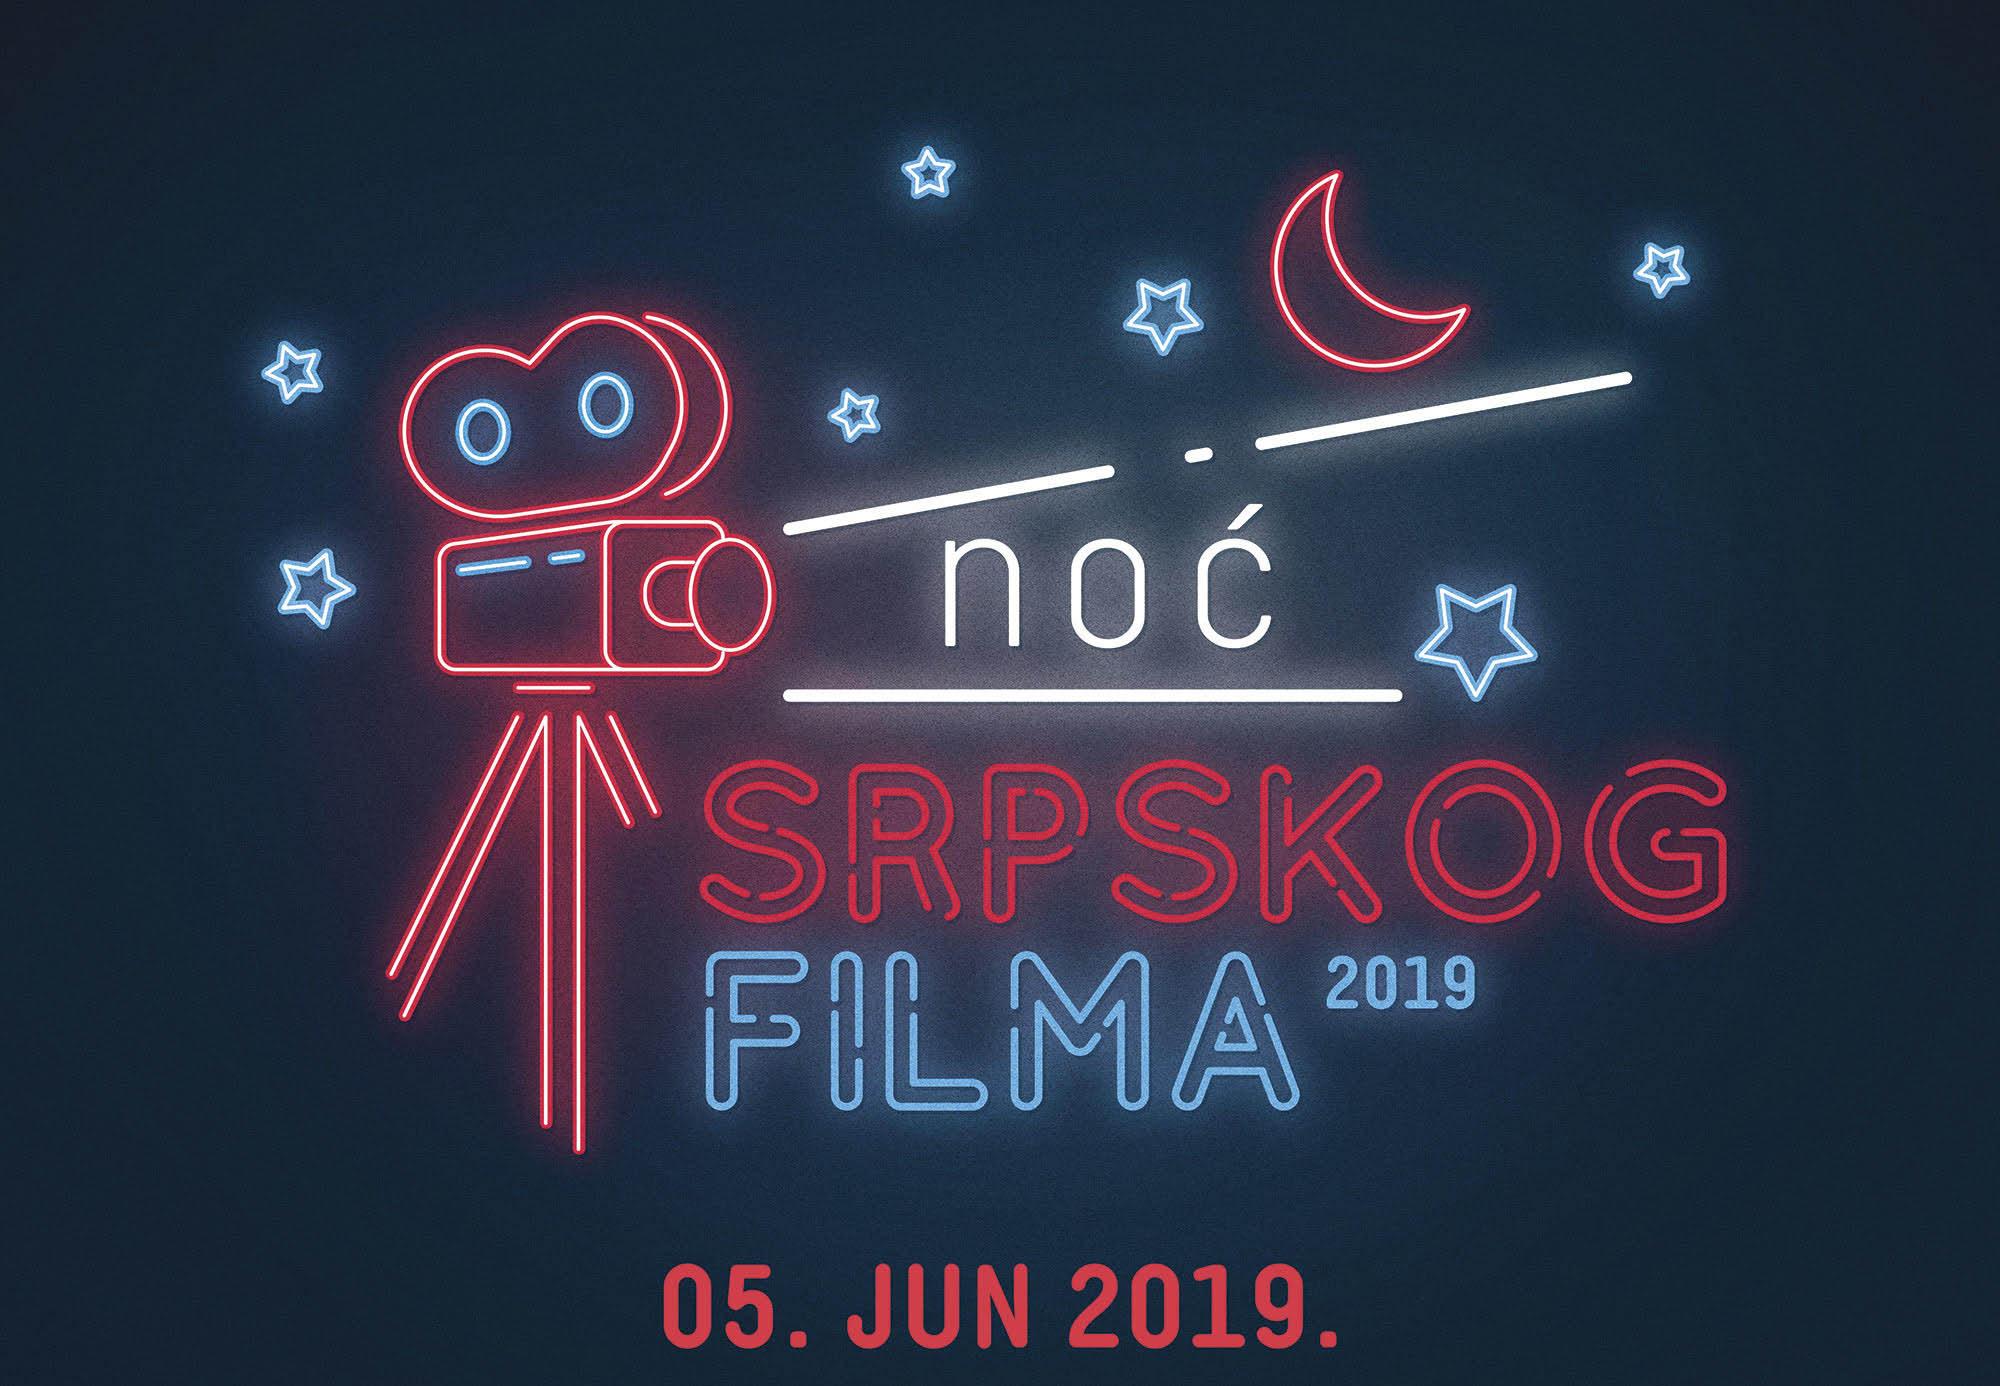 Plakat Noc srpskog filma